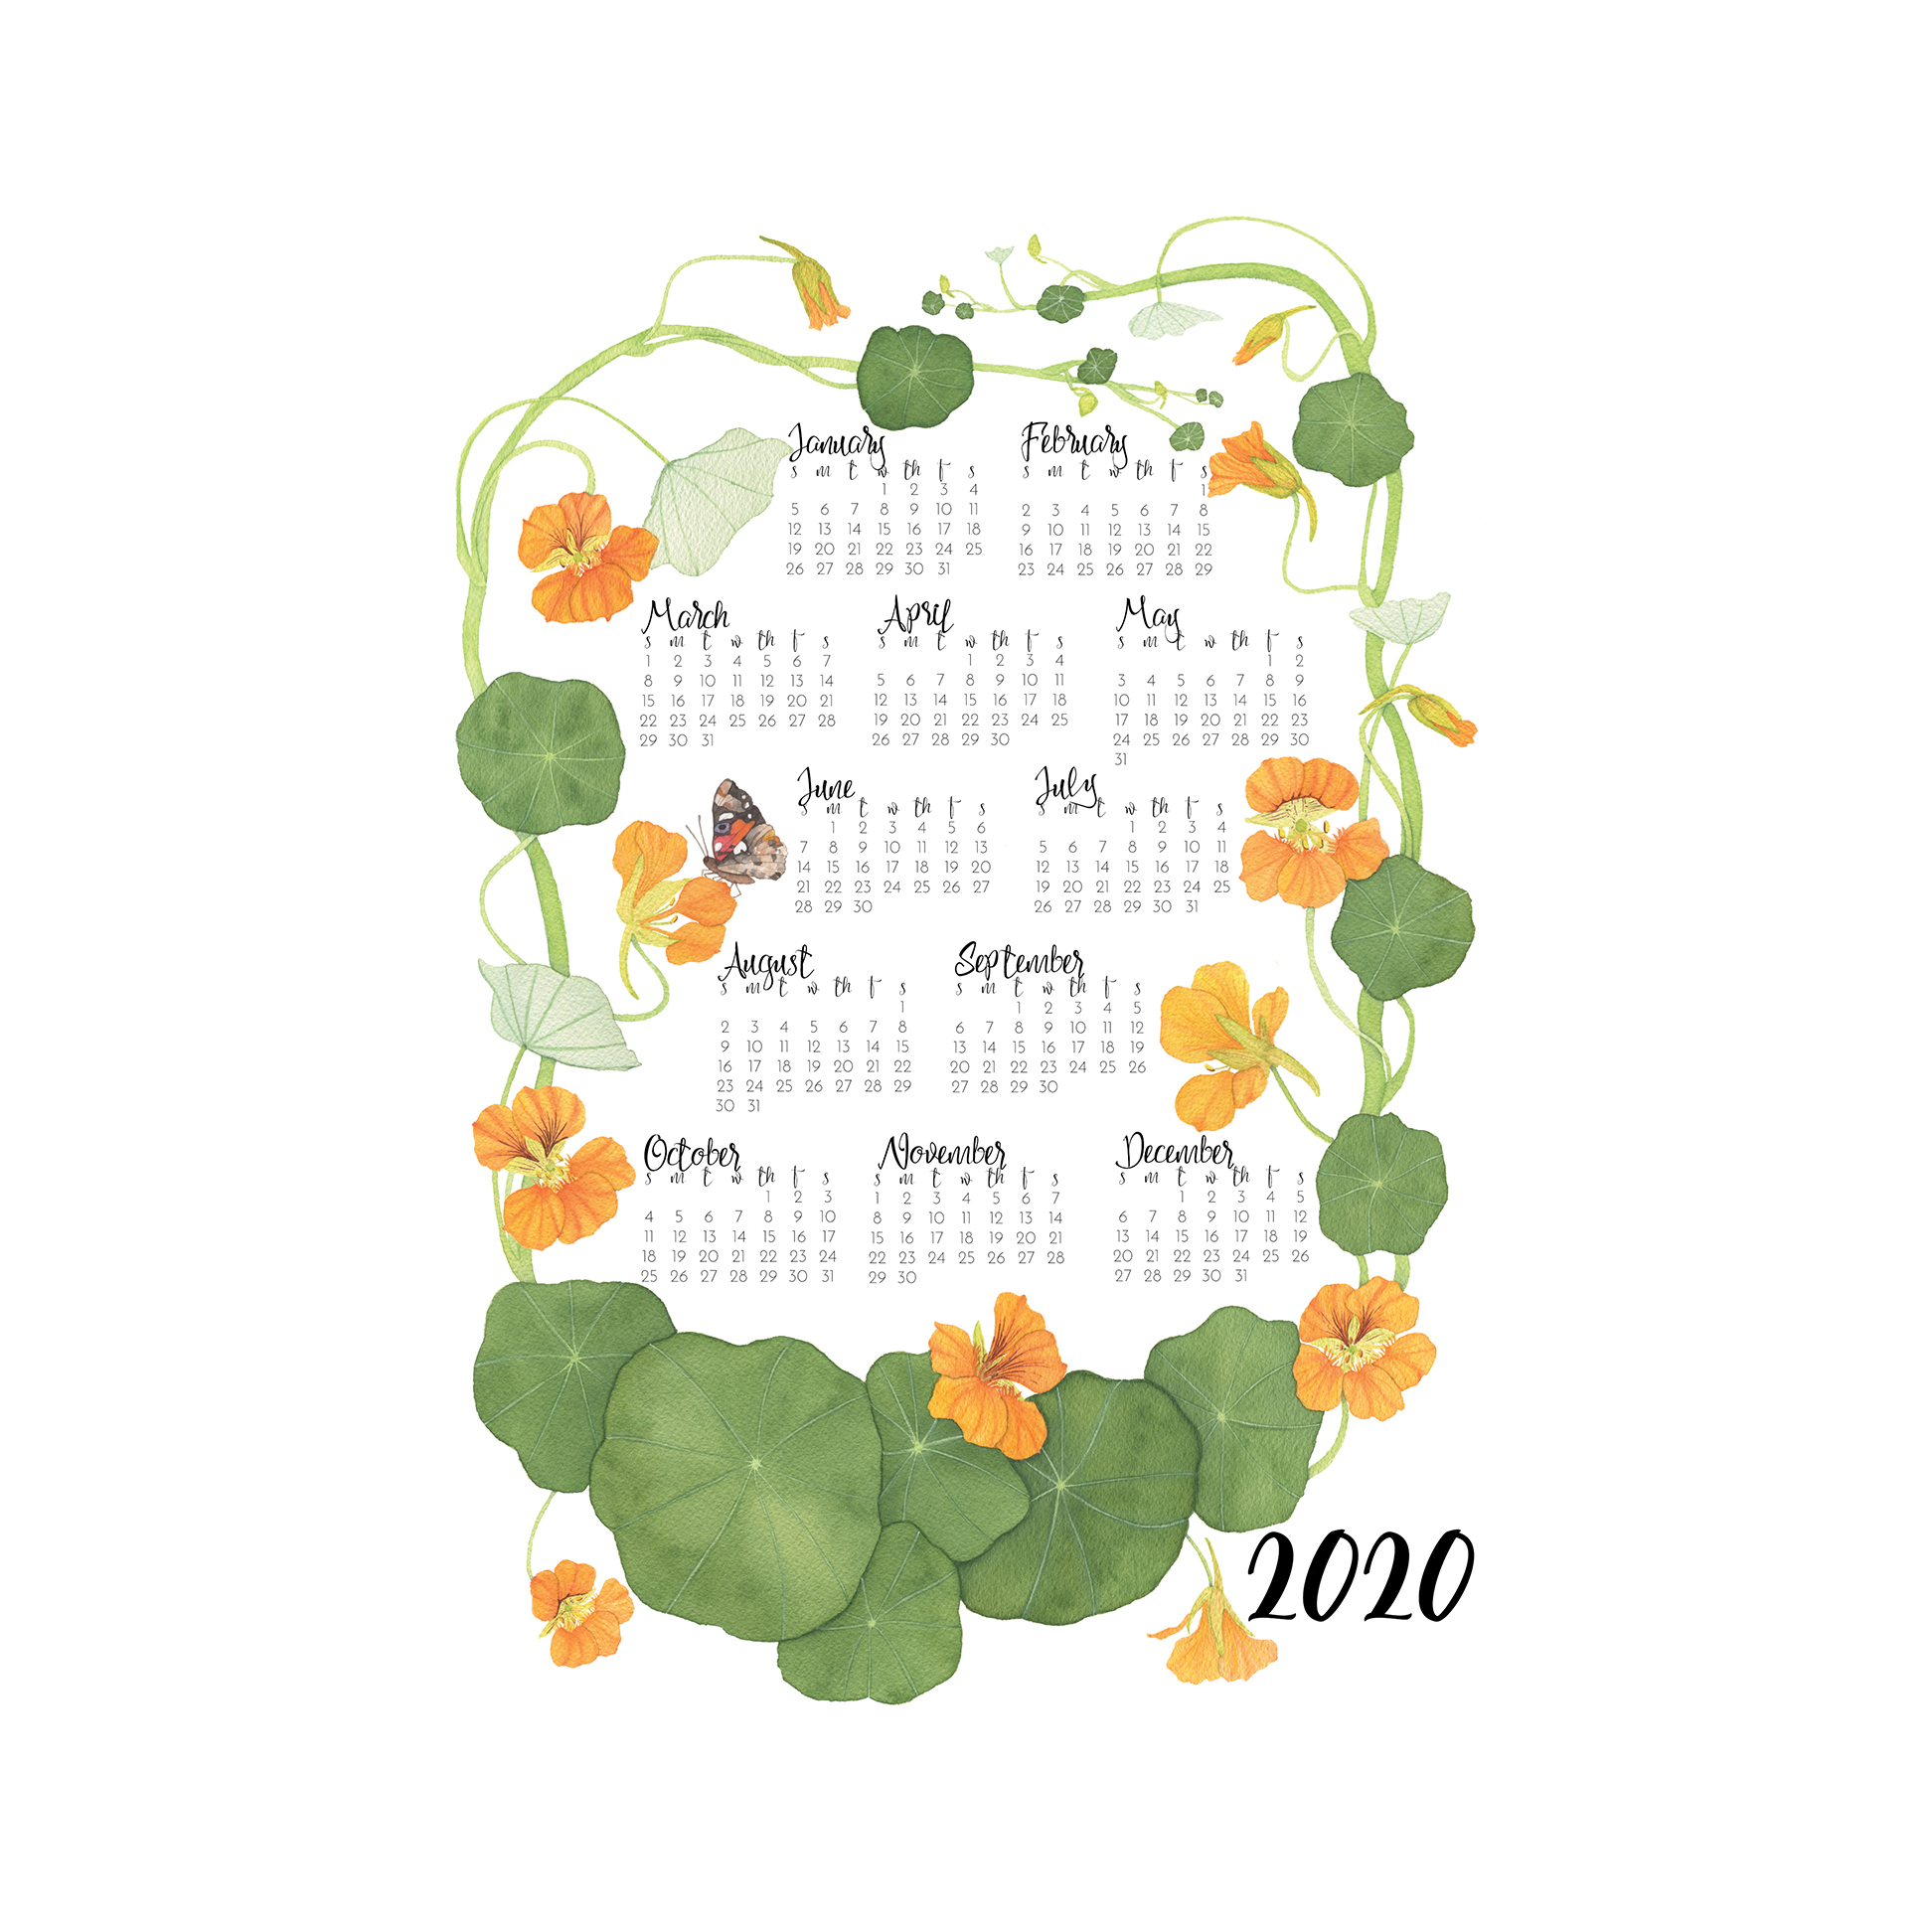 2020 Nasturtiums Tea Towel Calendar by Anne Butera